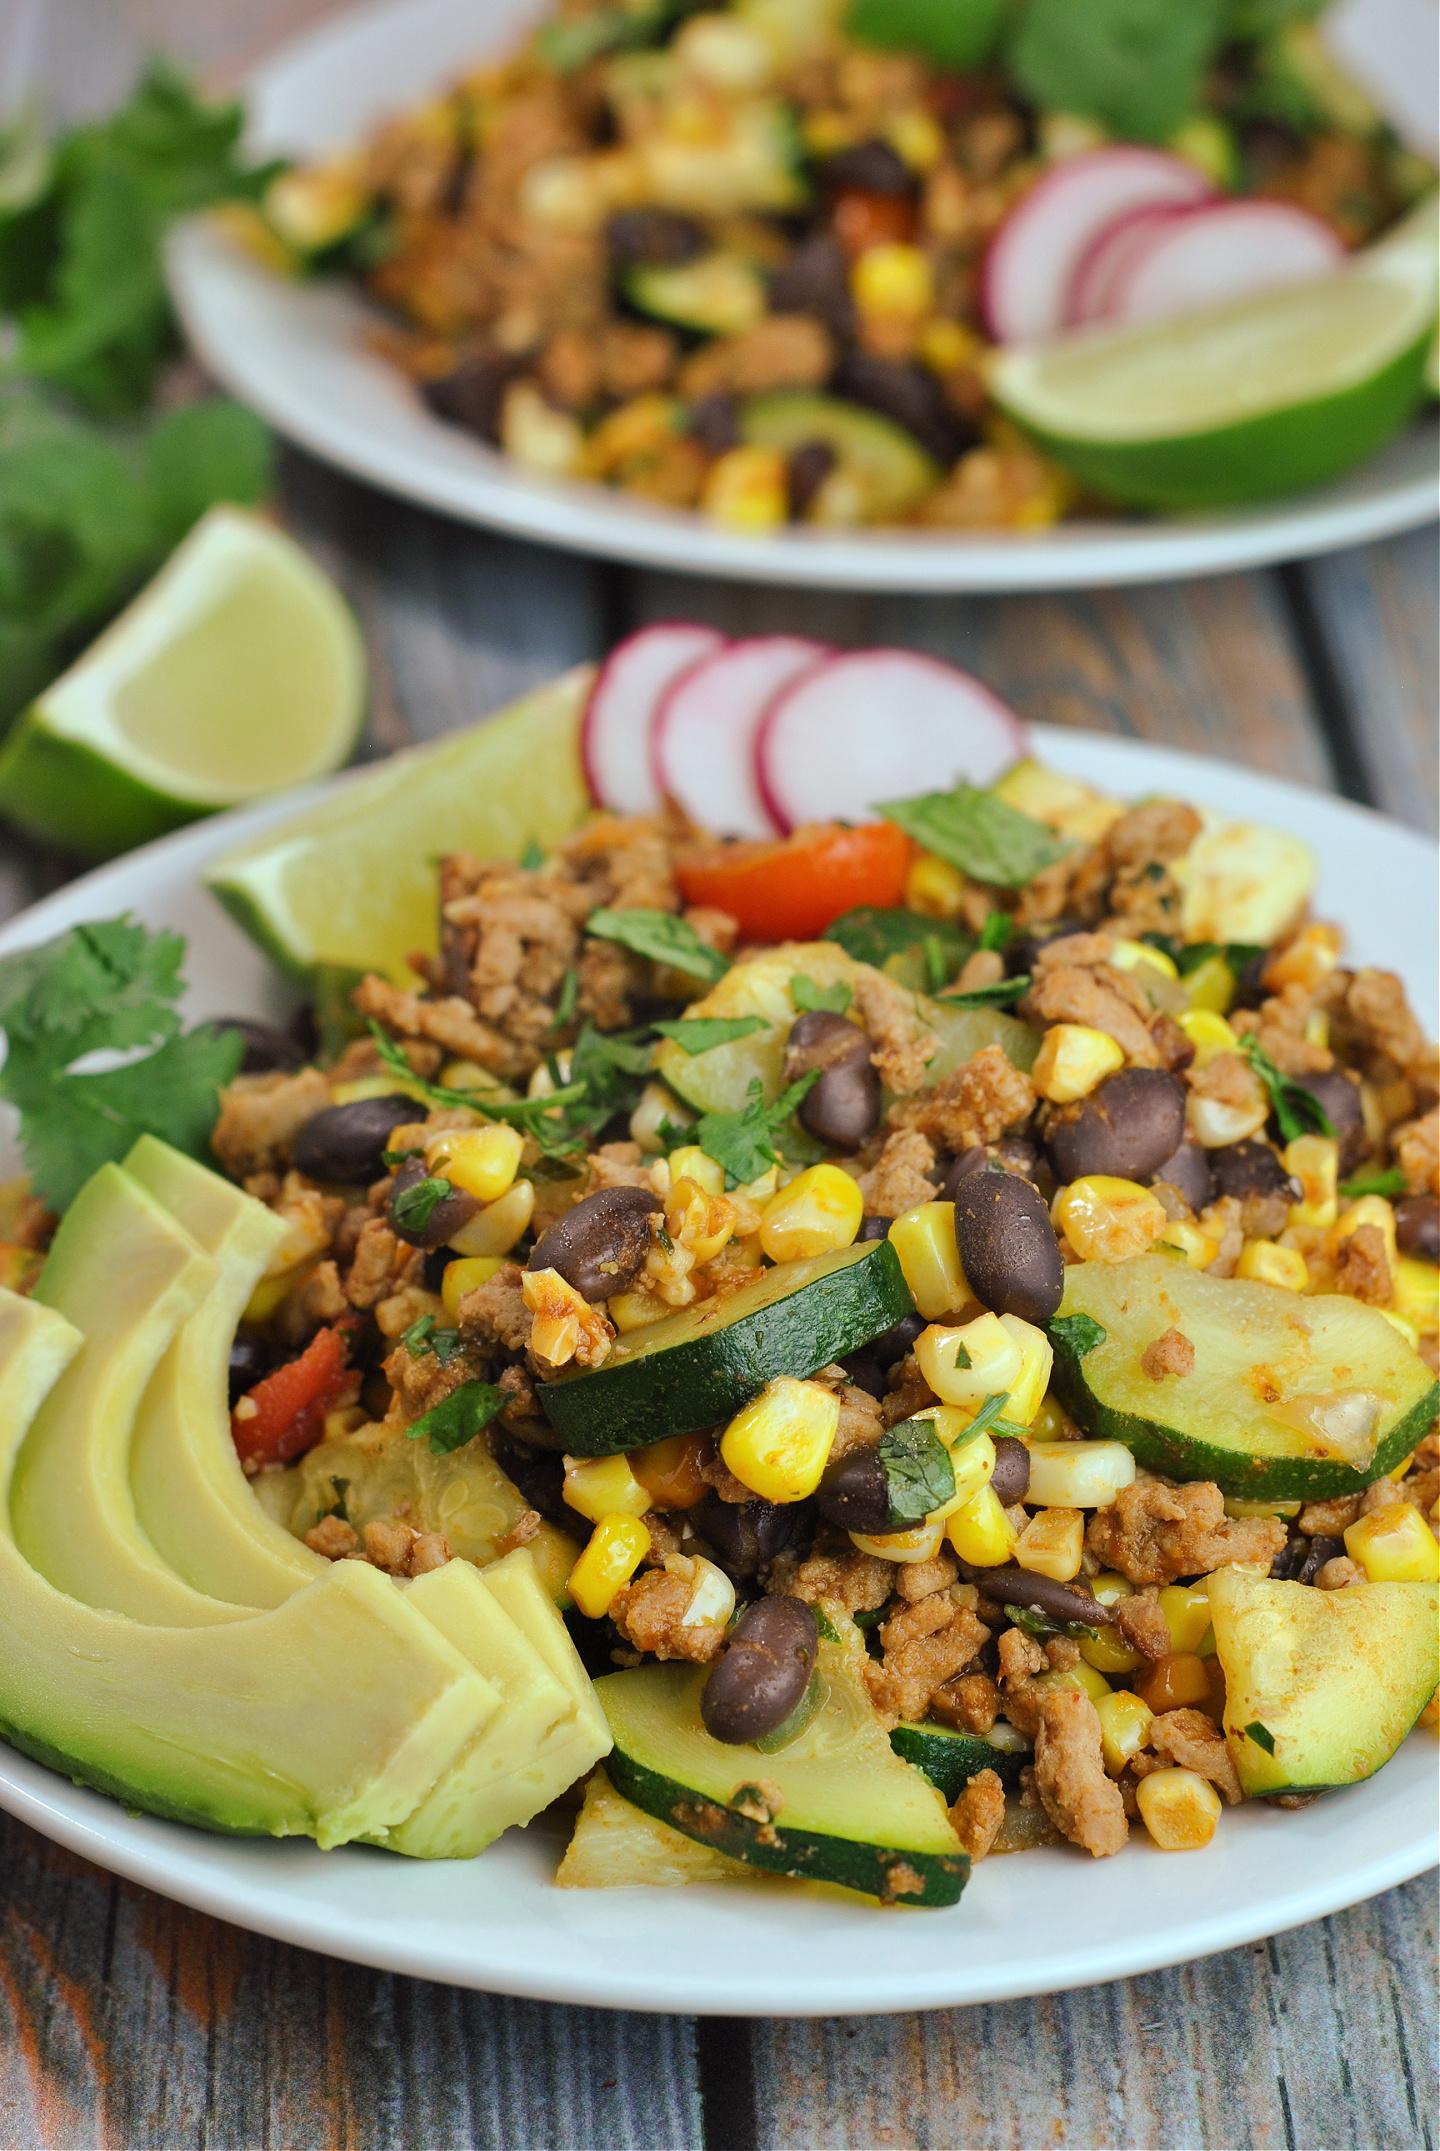 Ground Turkey Skillet with Zucchini, Corn, Black Beans, and Tomato via @preventionrd